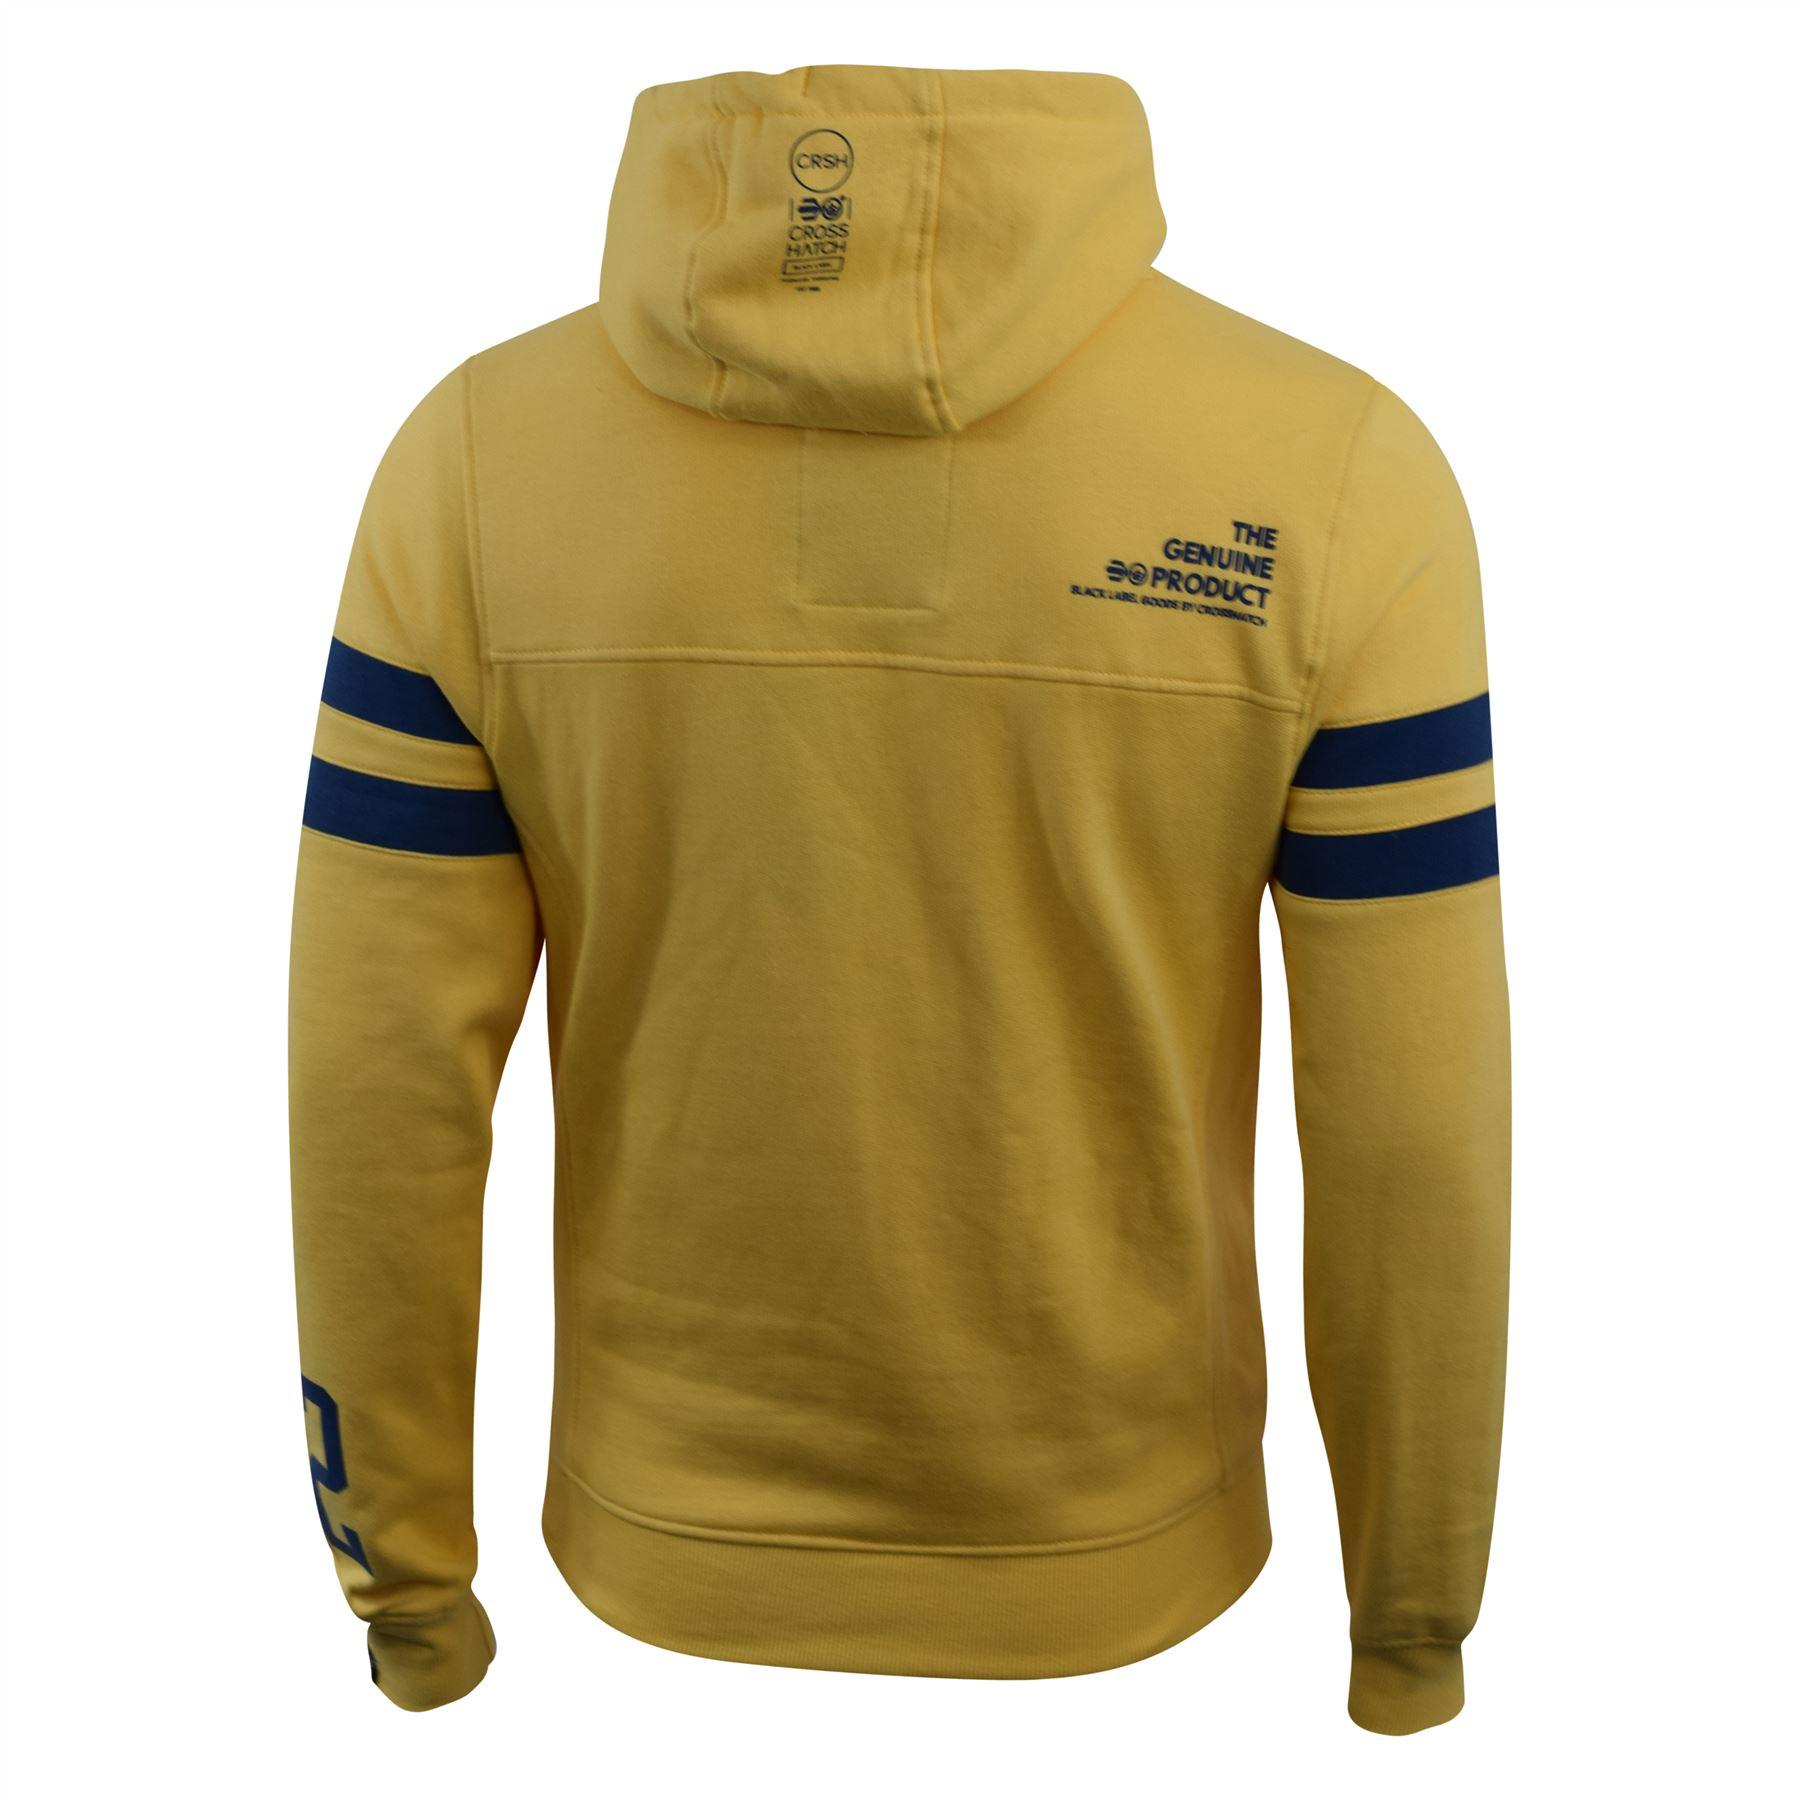 Mens-Hoodie-Crosshatch-Clothing-Sweatshirt-Hooded-Jumper-Top-Pullover-Cramform thumbnail 10